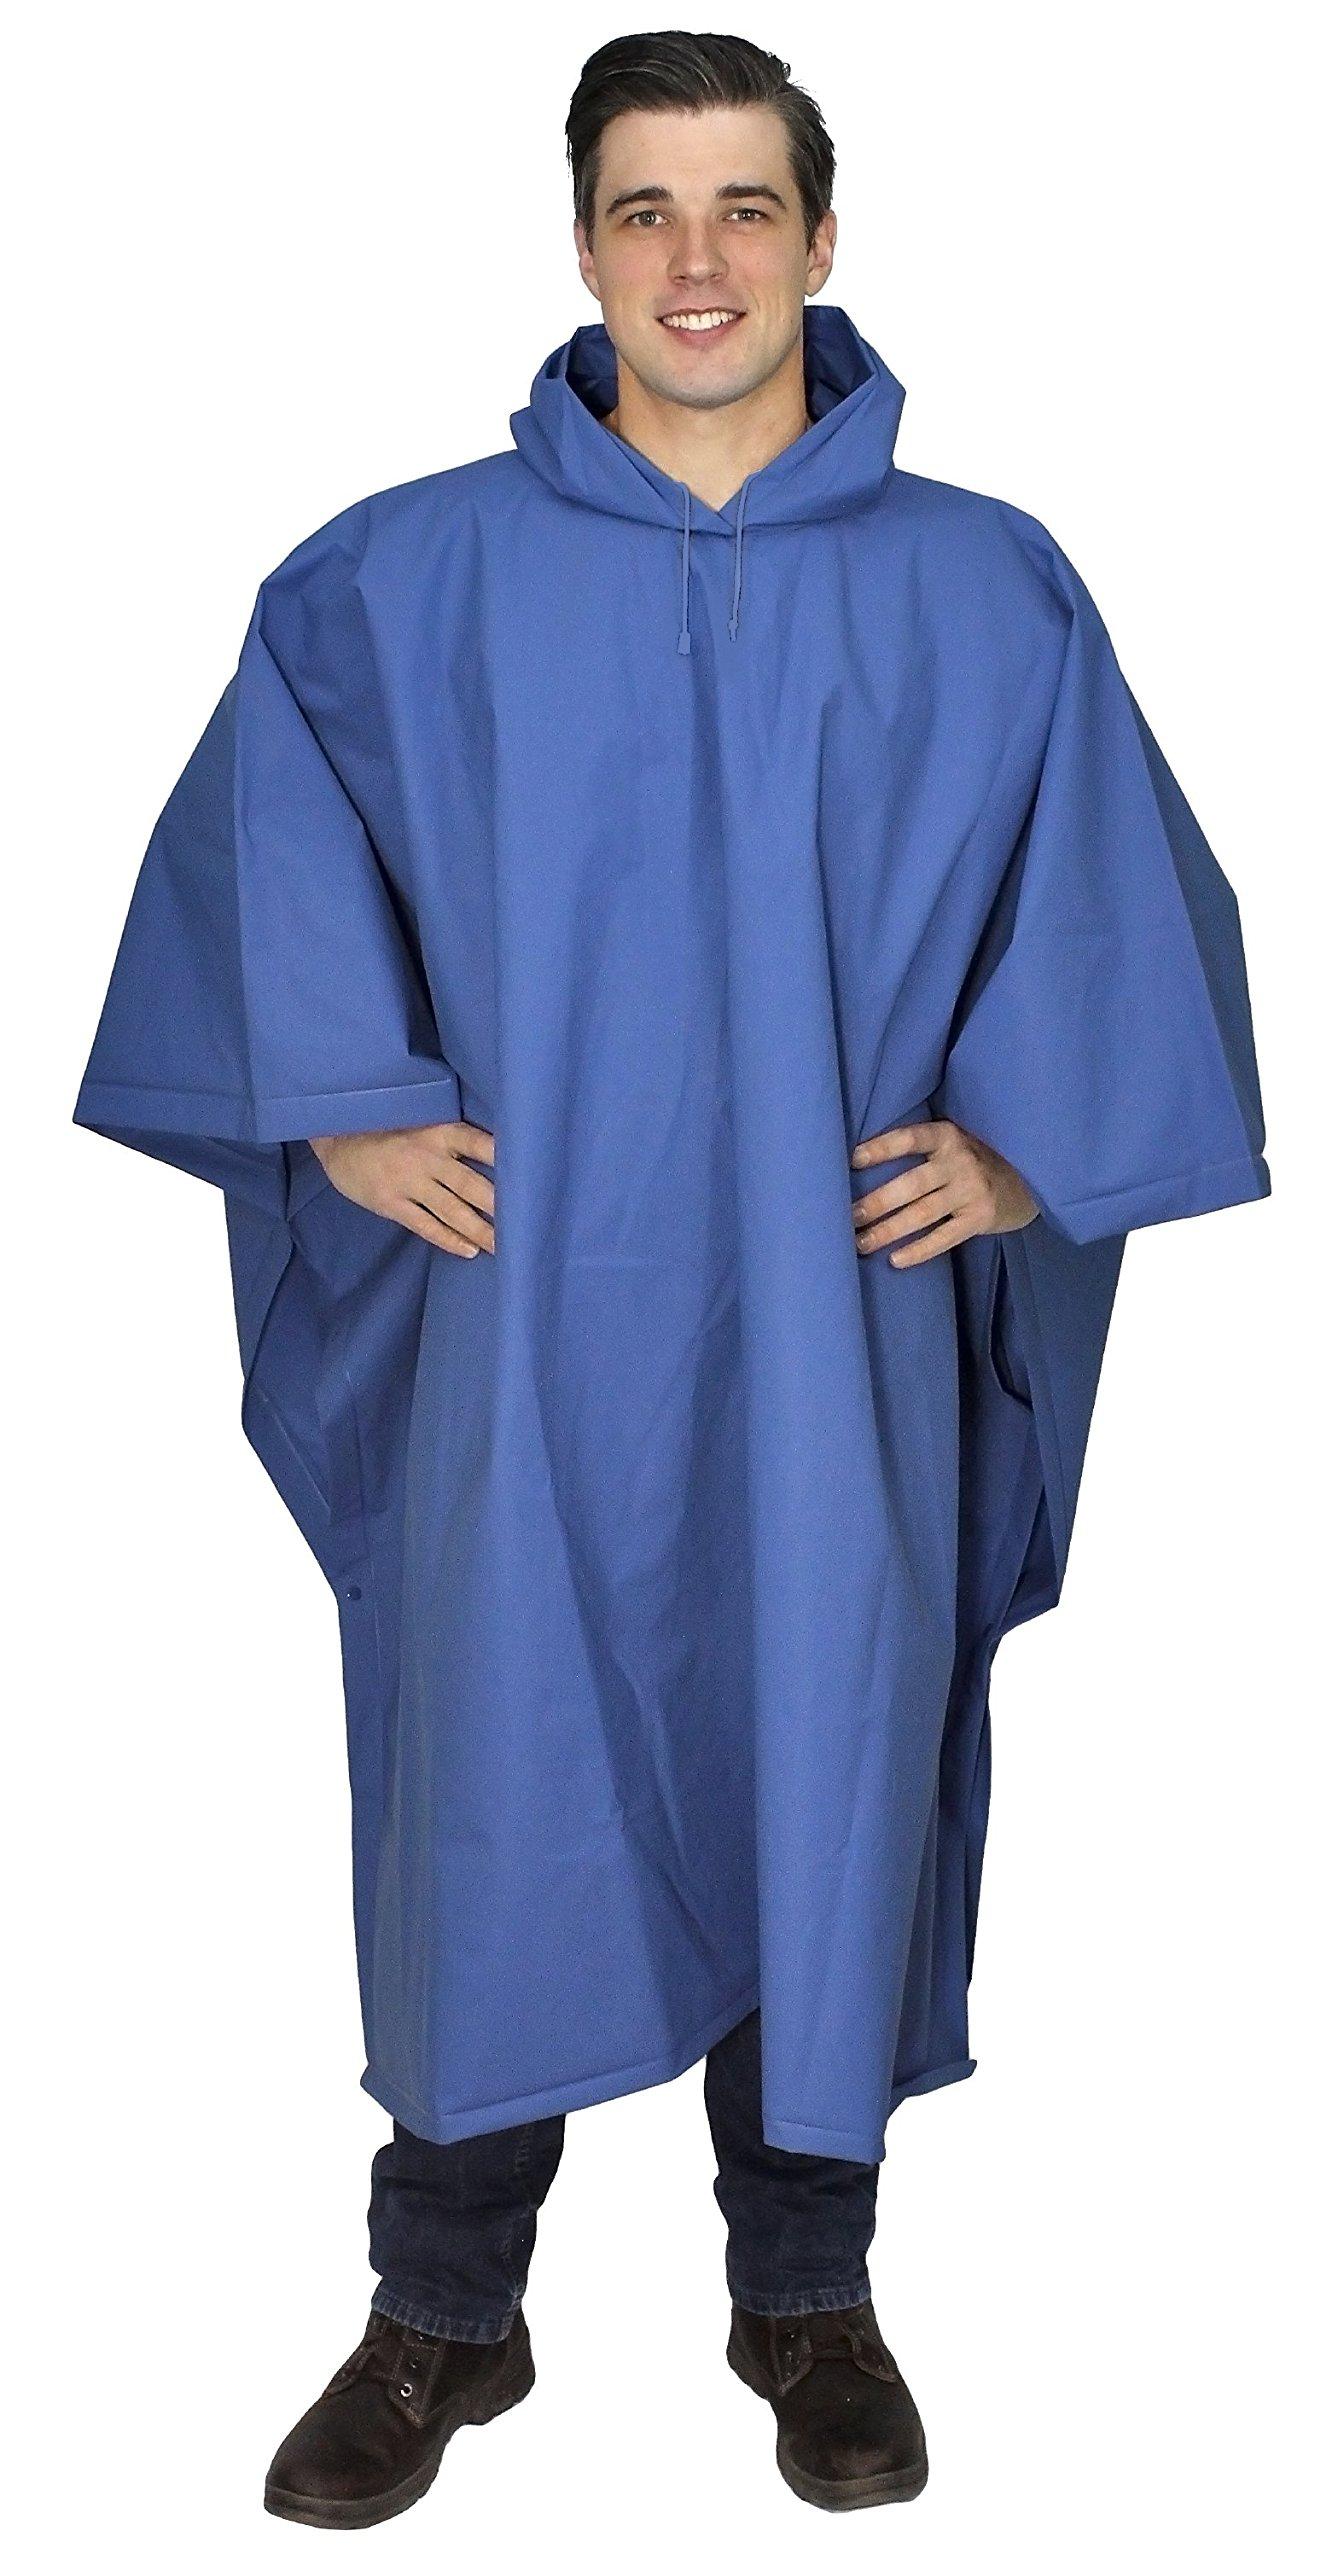 Galeton 12714-BL Repel Rainwear XL & Tall .22mm EVA Poncho (Big & Tall), One Size, Blue